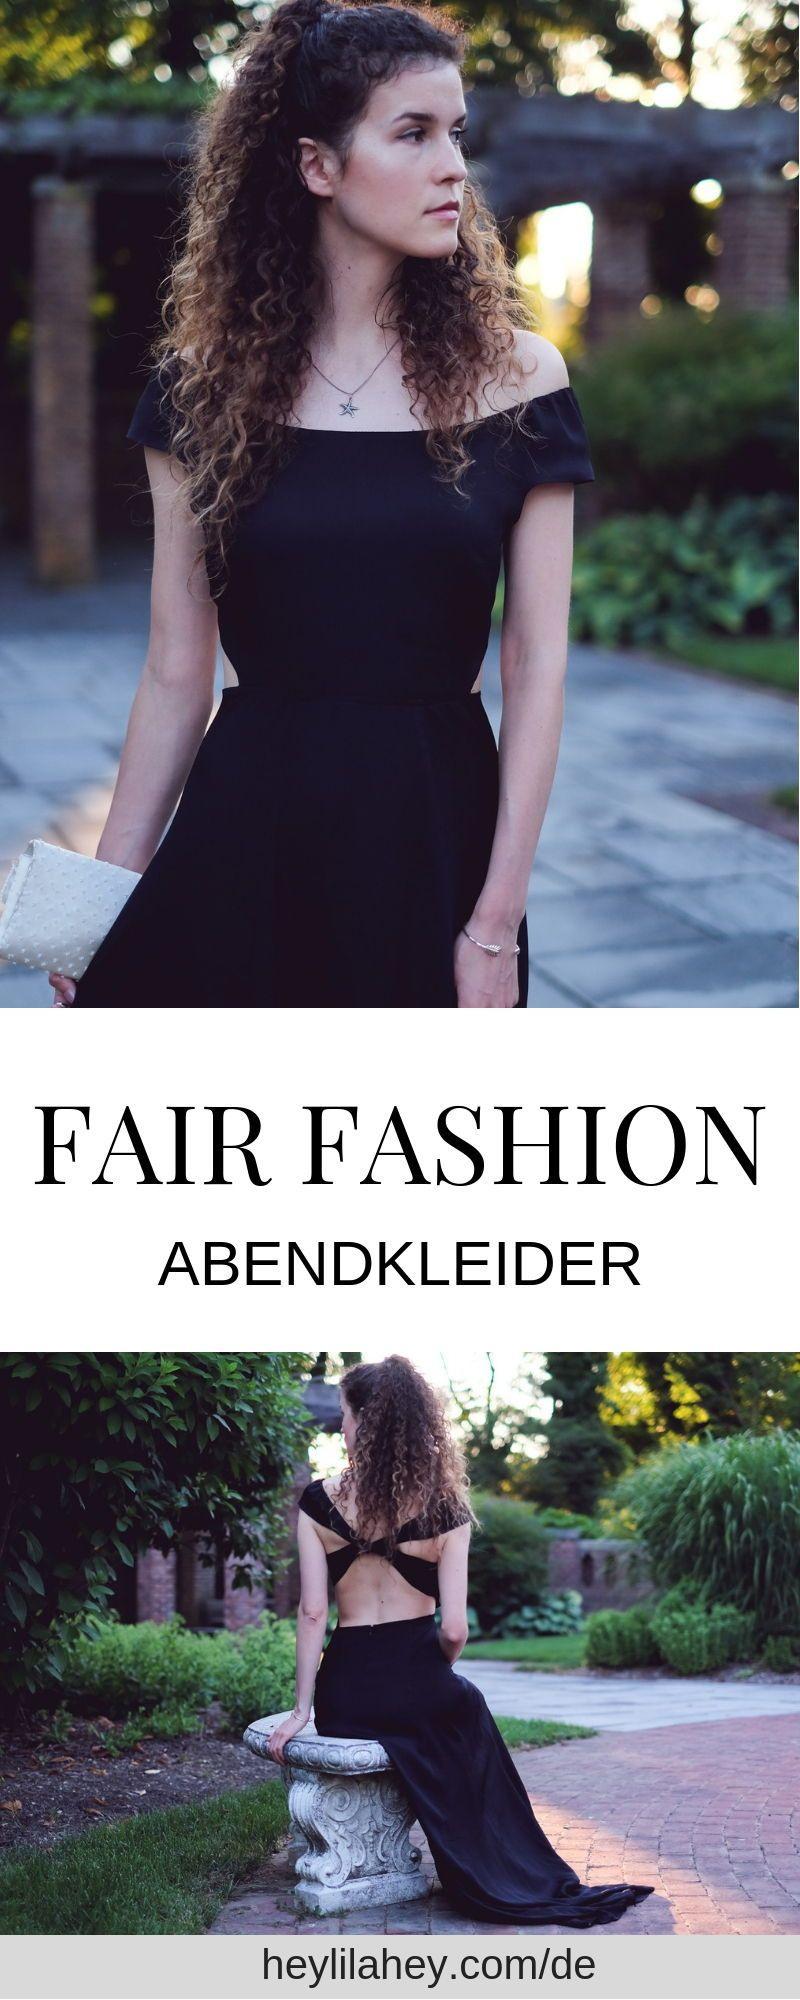 15 Cool Nachhaltige Mode Abendkleid Bester Preis15 Schön Nachhaltige Mode Abendkleid Spezialgebiet